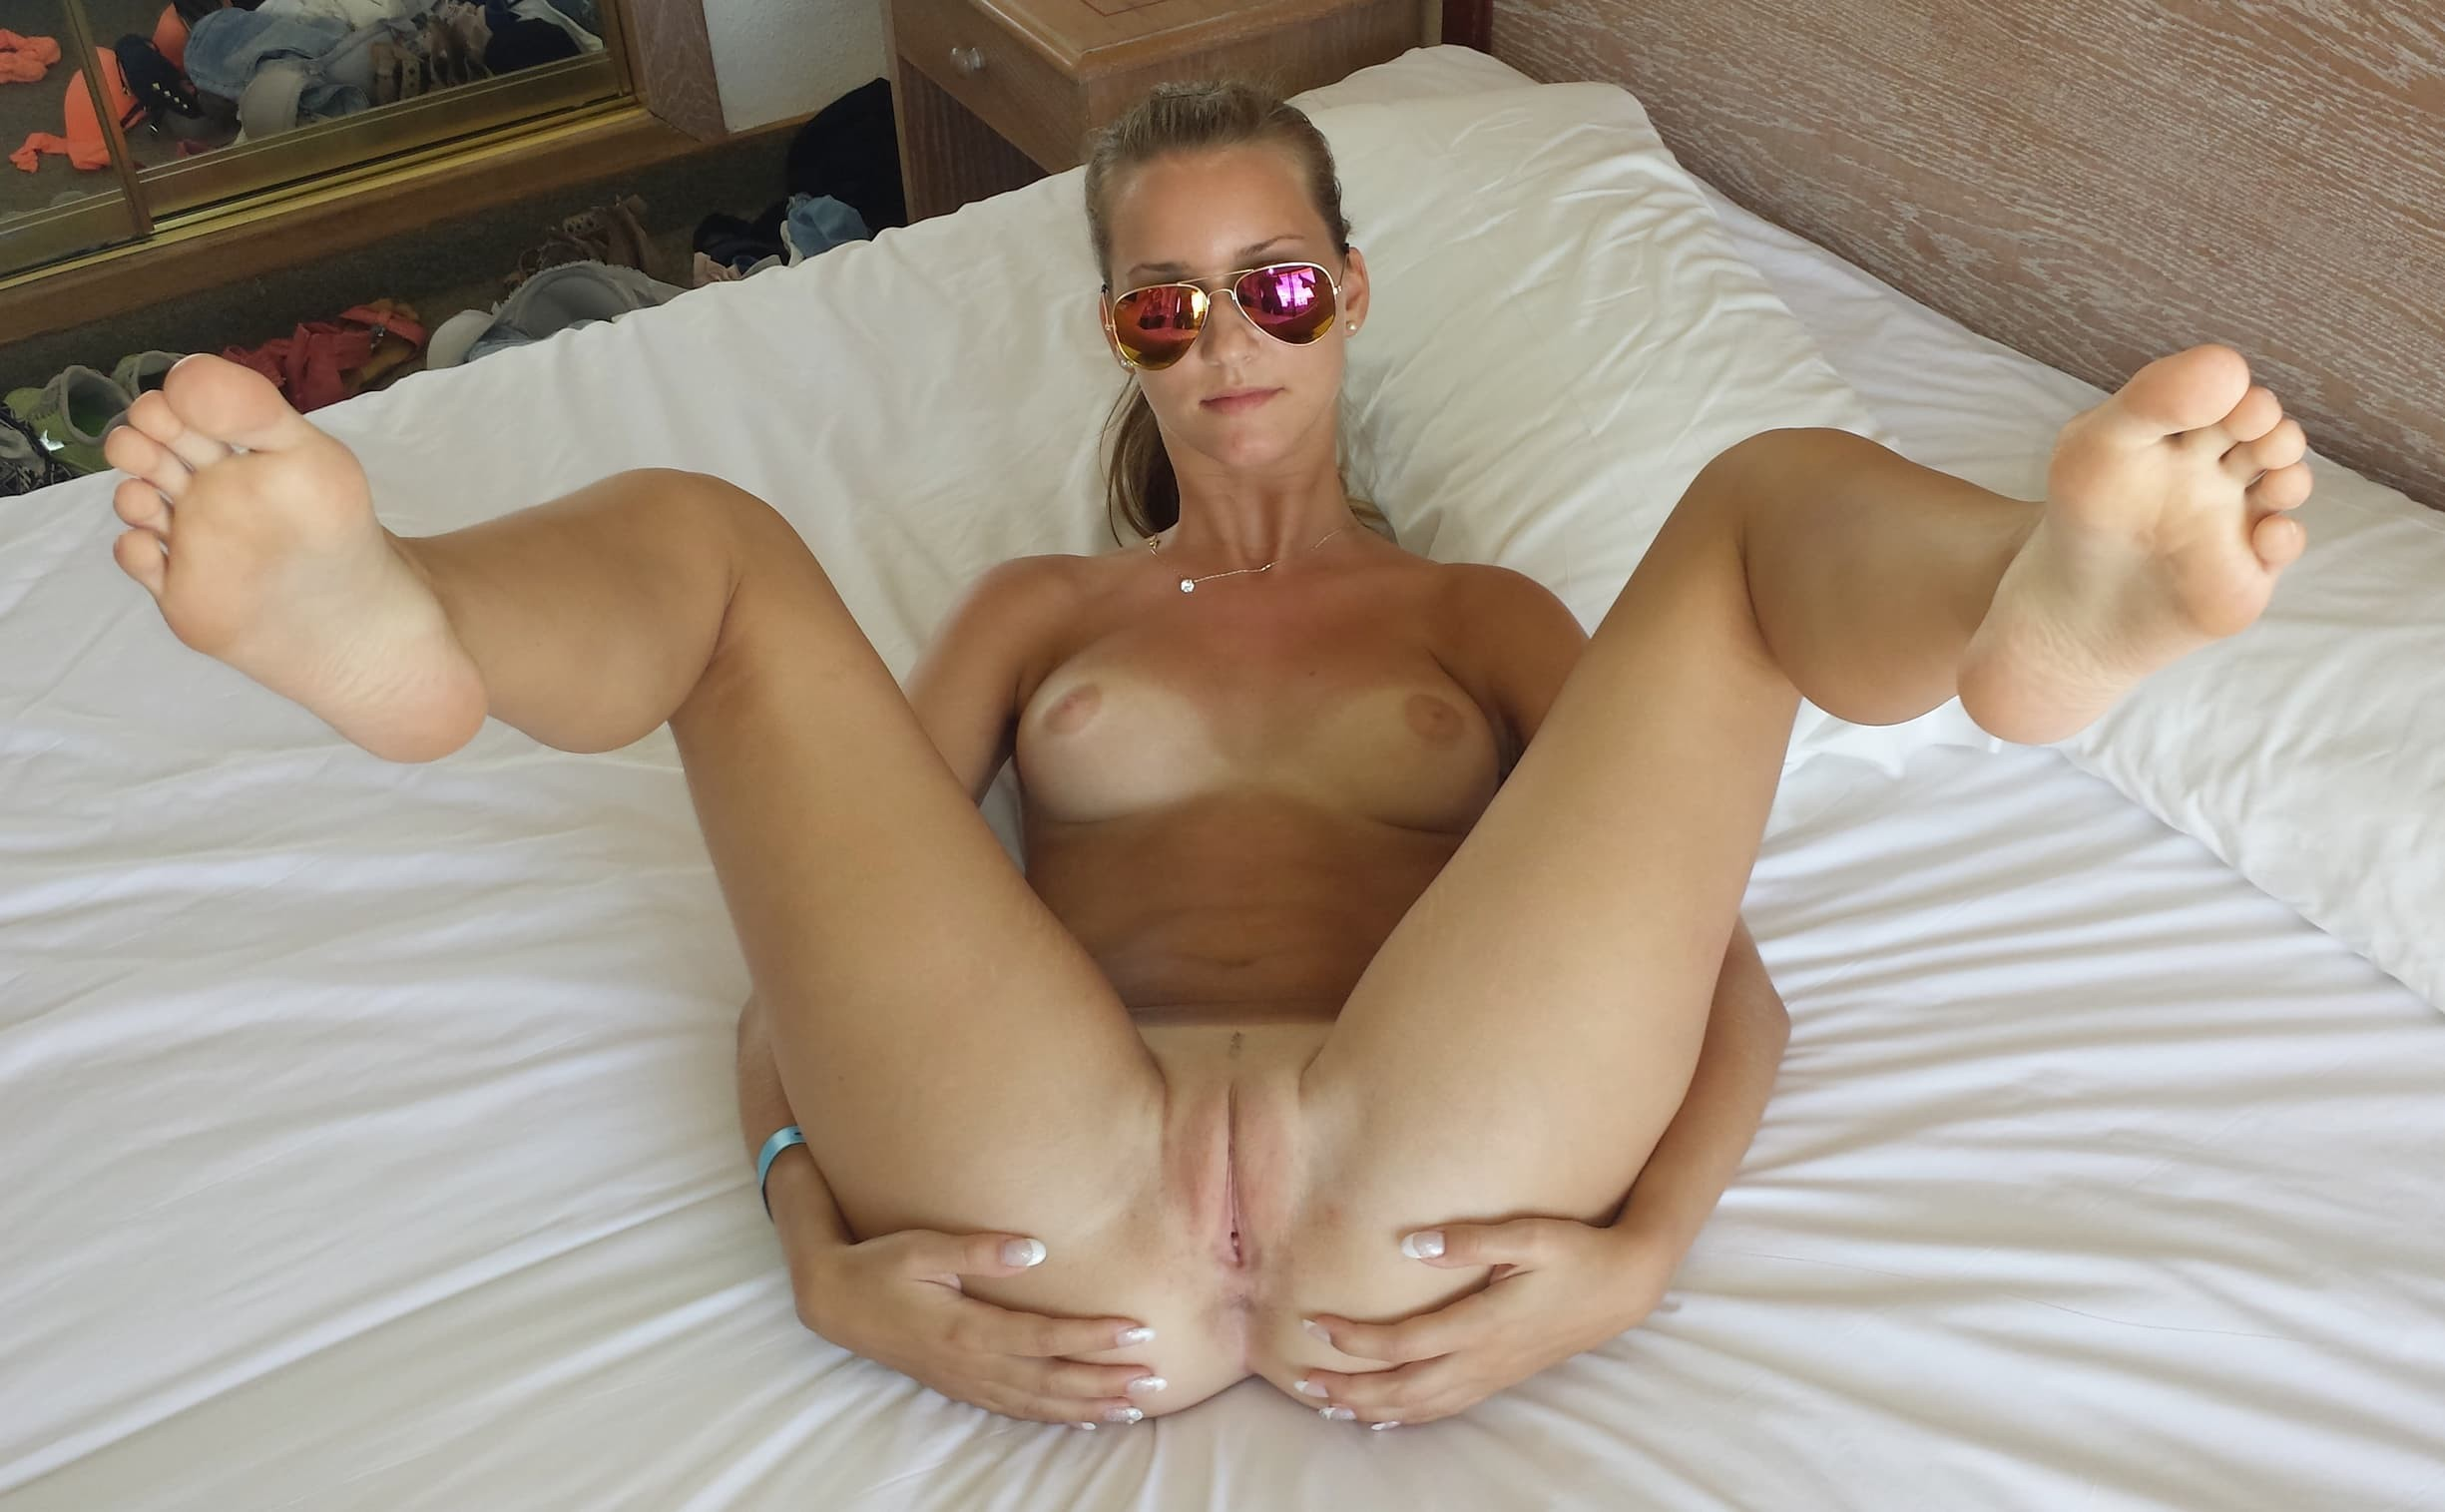 Любовница в чулках раздвигает ноги в отеле - эротика